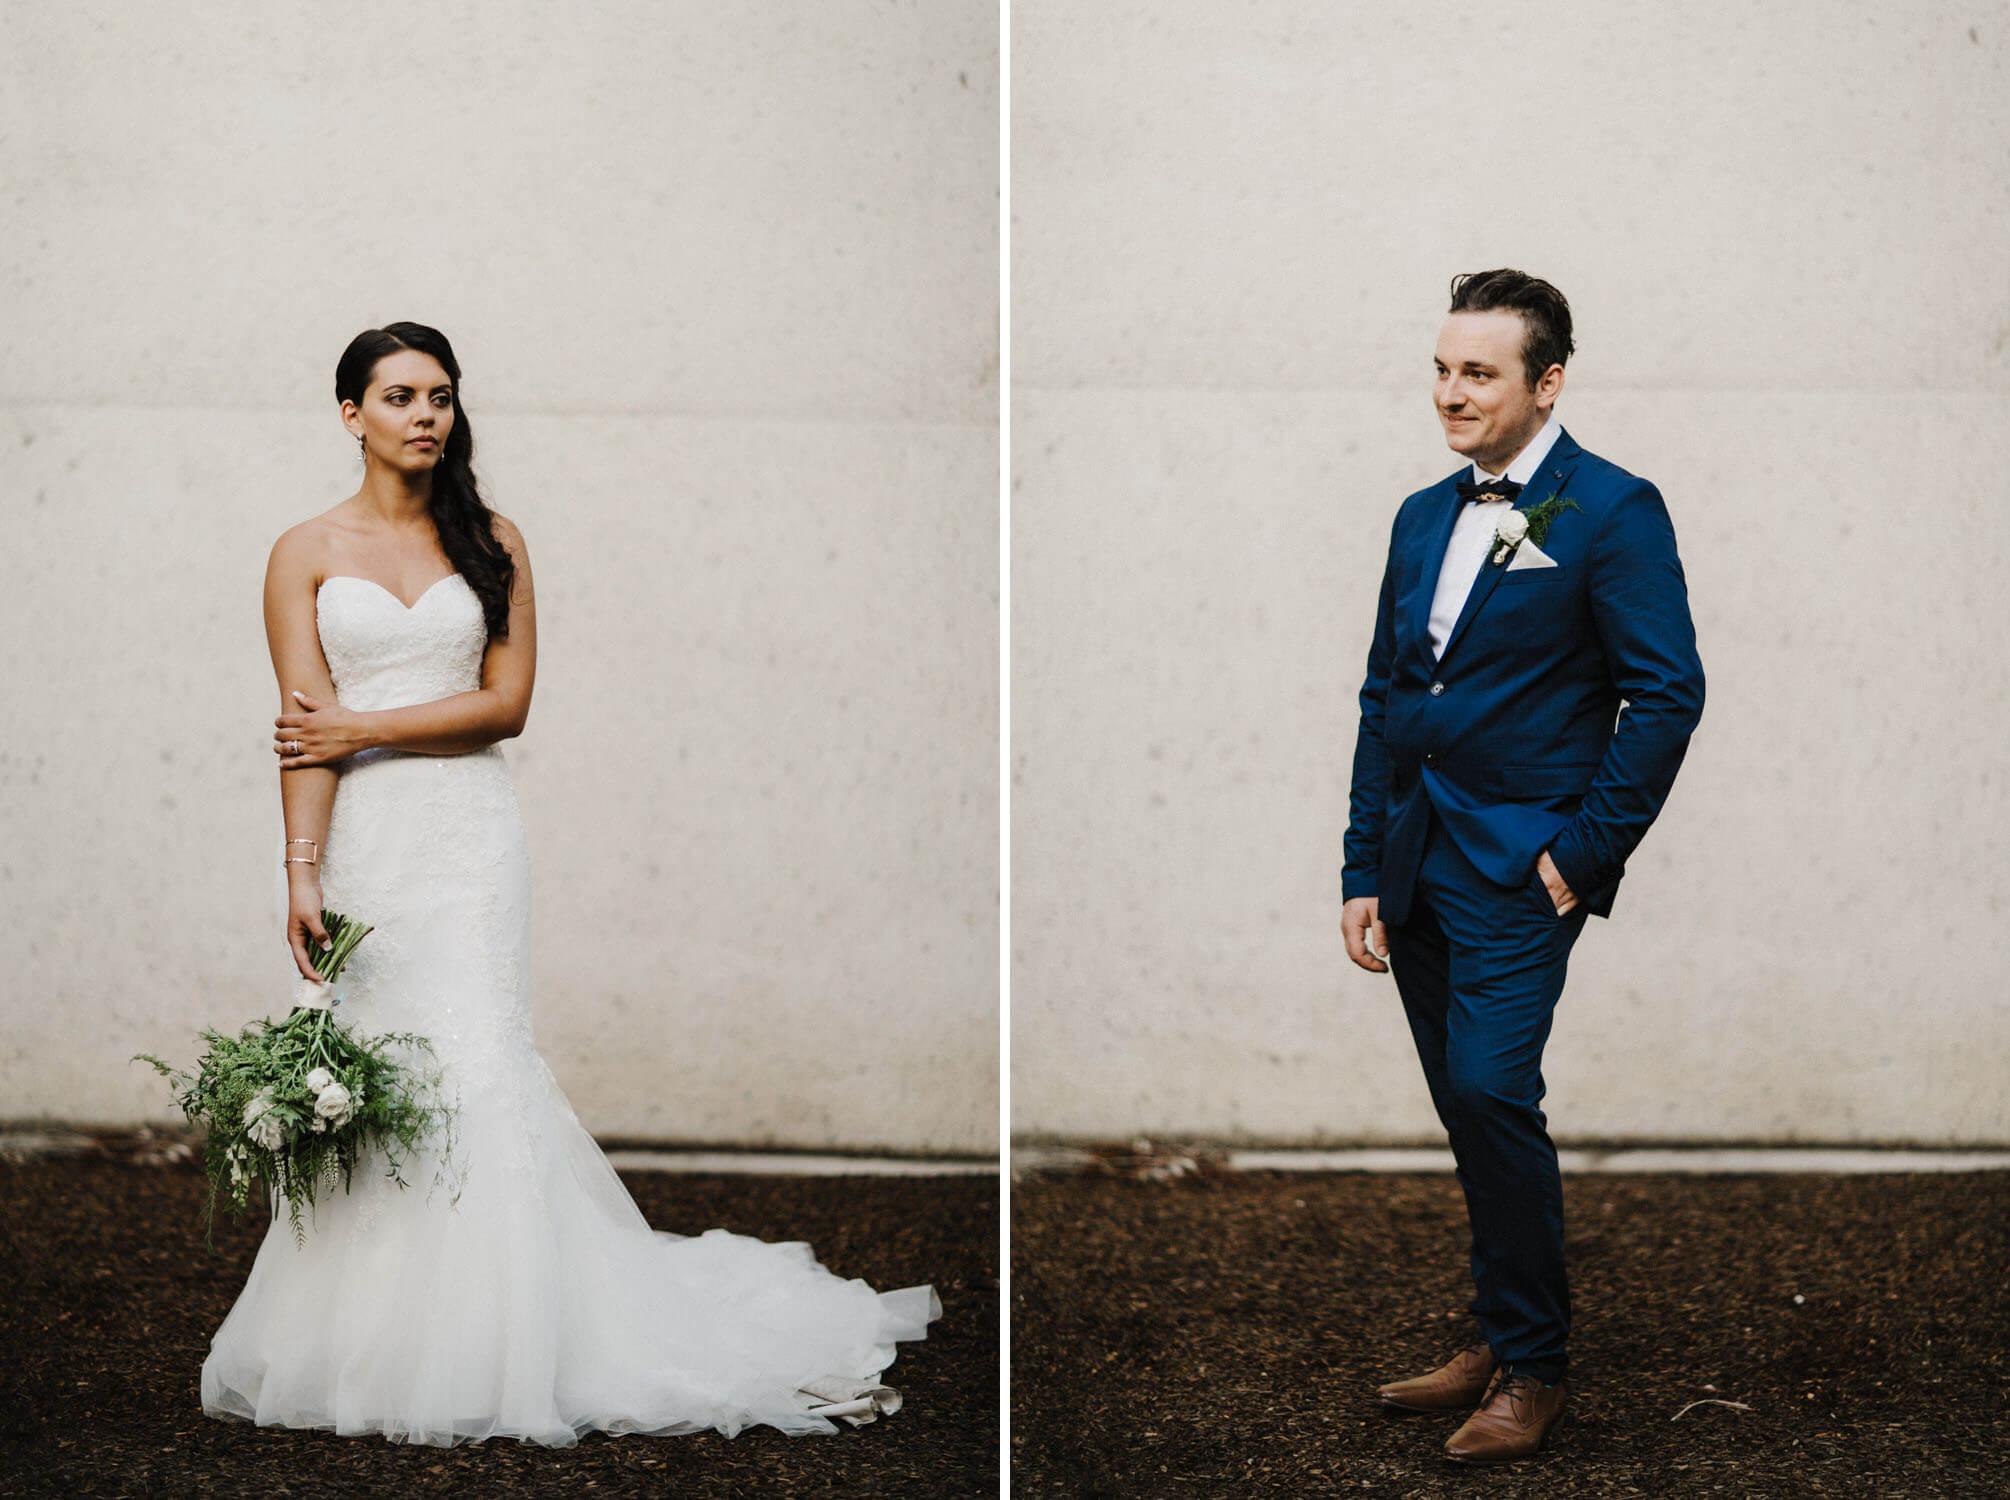 wedding-national-gallery-australia-114(0645)2.jpg